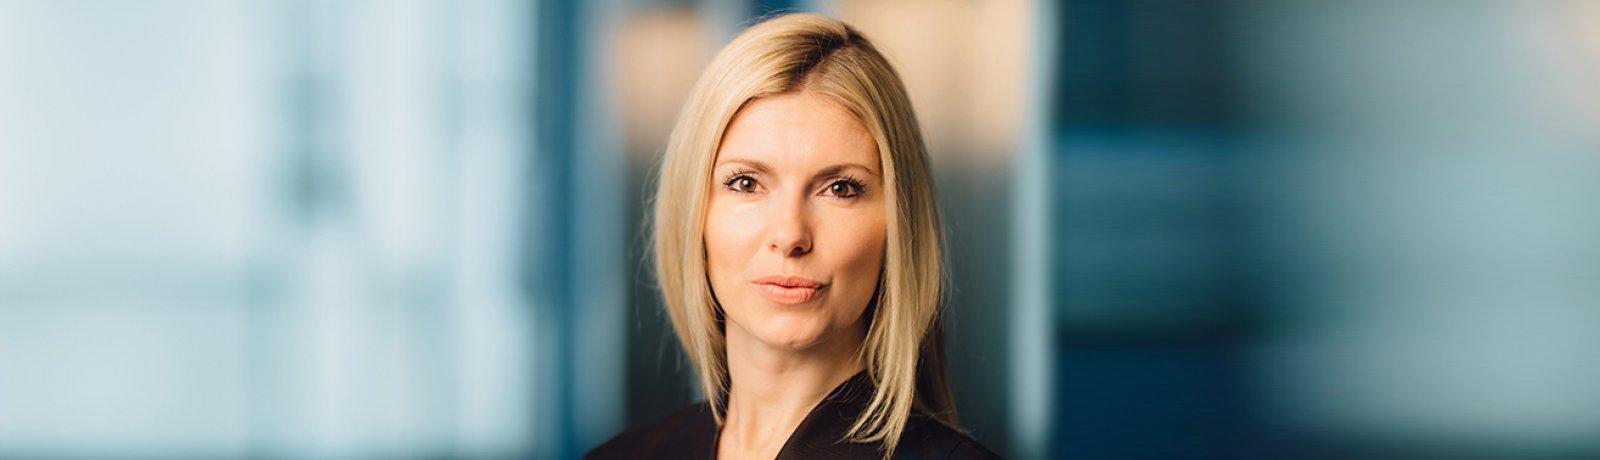 Kathrin Buvac, chief strategy officer, Nokia